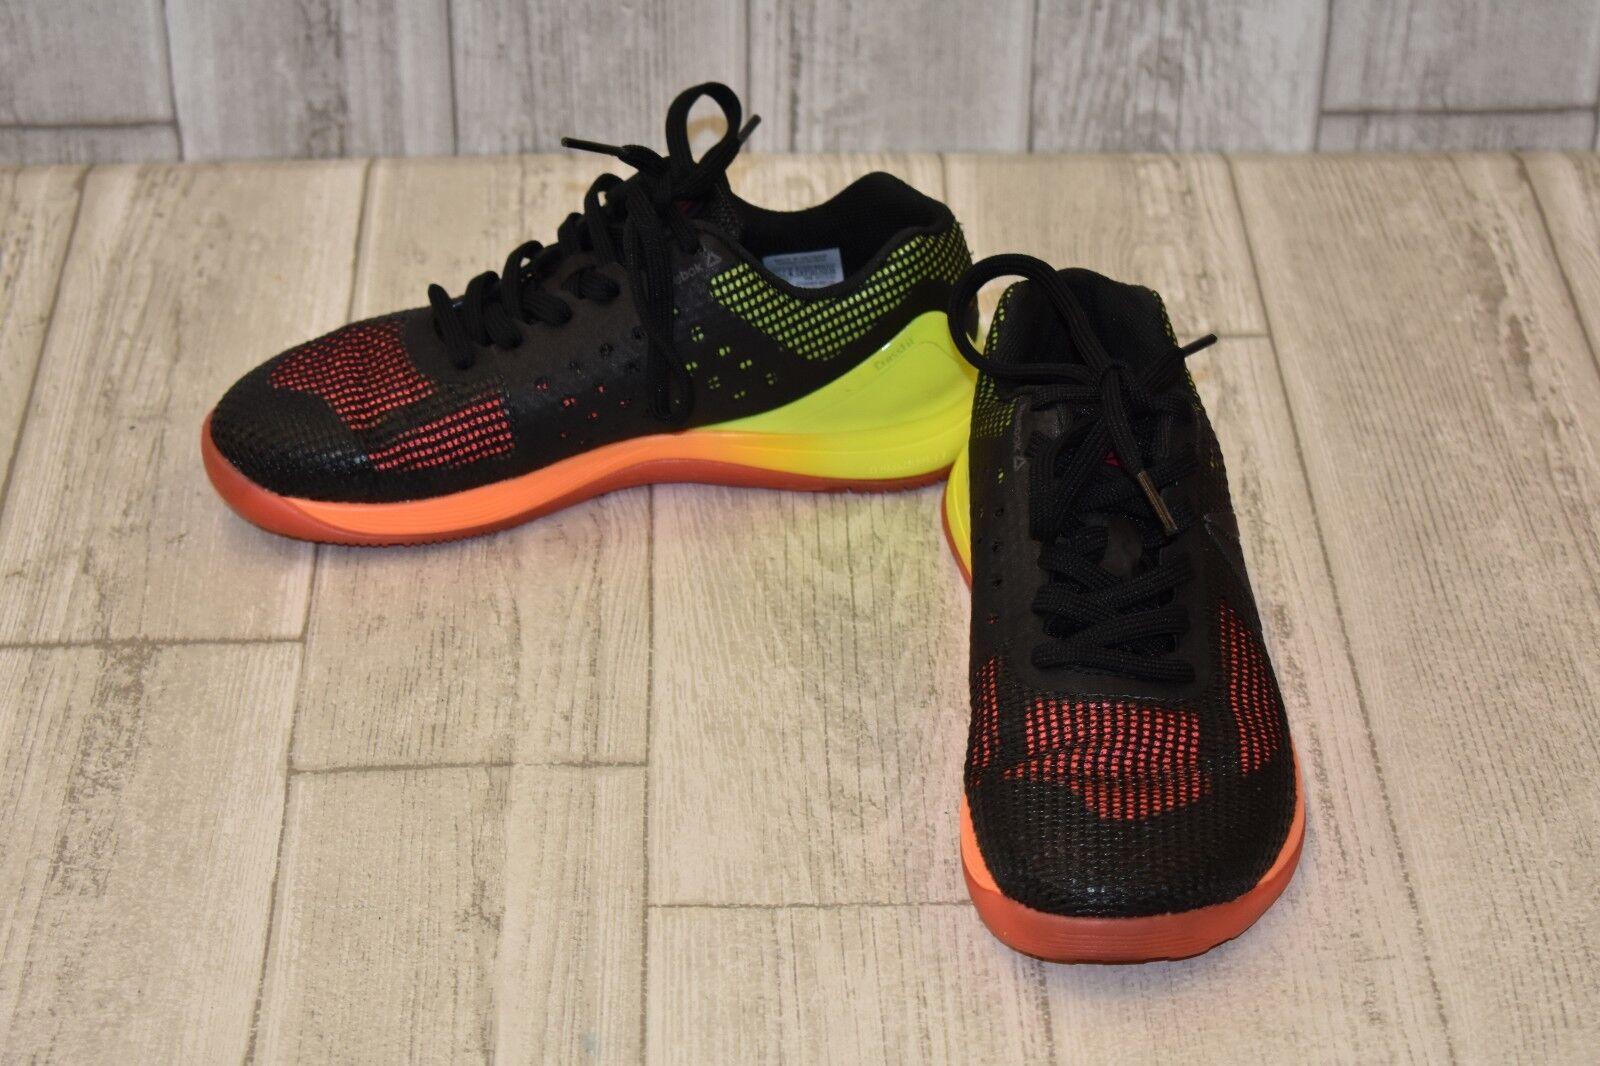 Reebox Crossfit Nano 7.0 7.0 7.0 Sneakers - Women's Size 6.5, Black Multi bbd4db